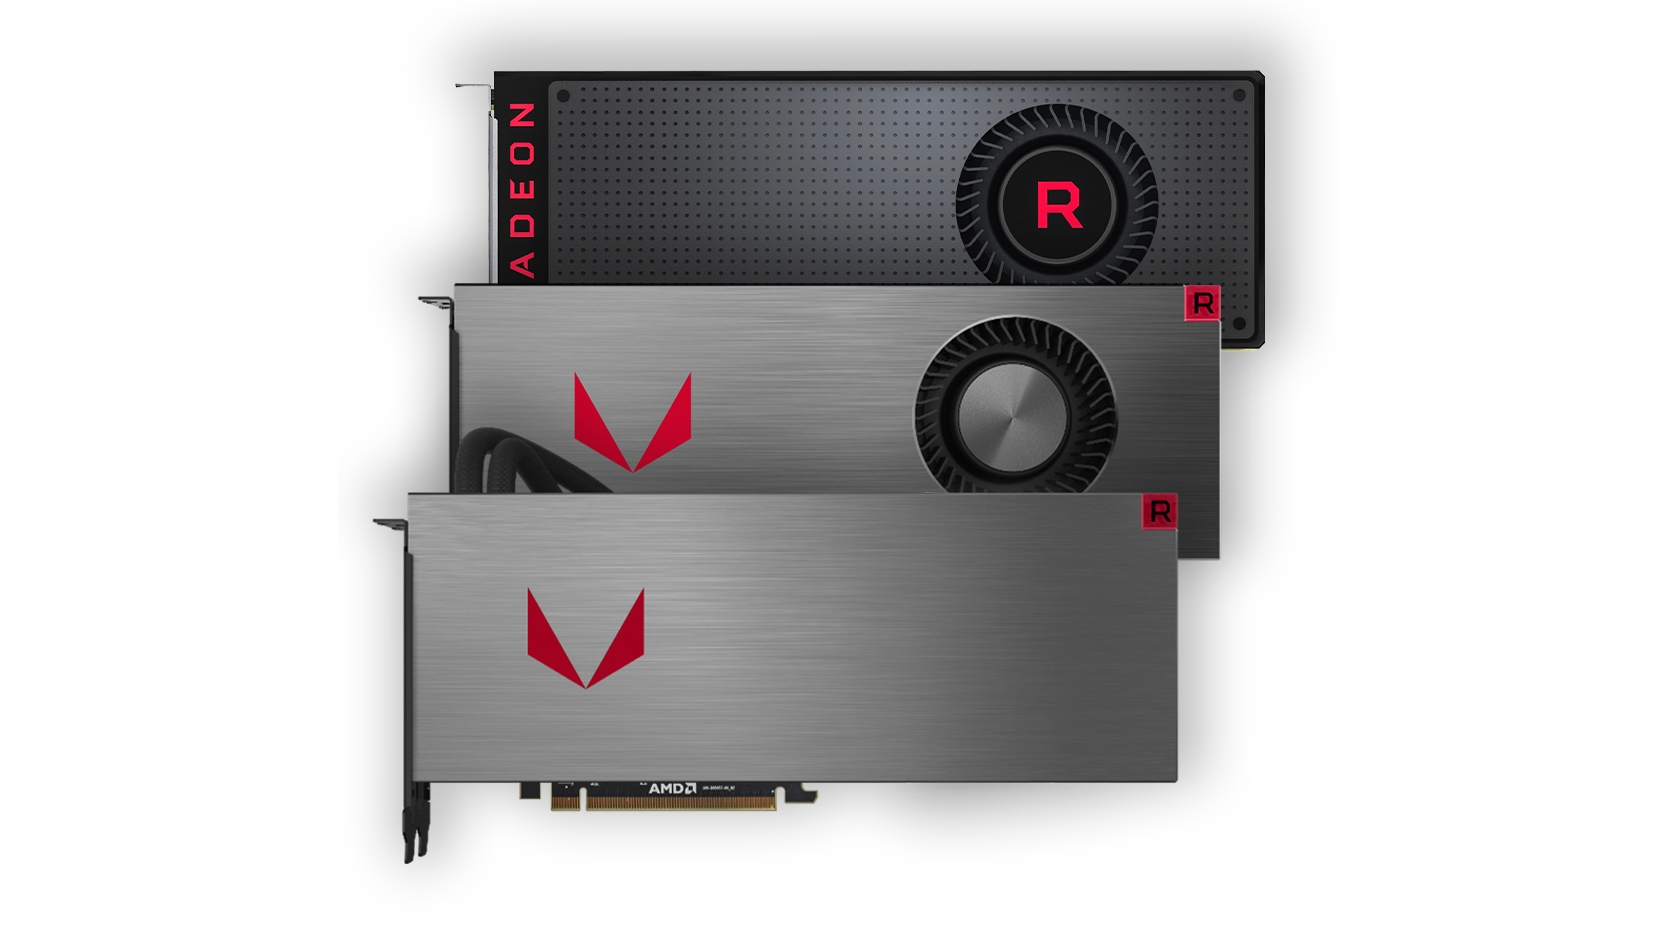 AMD RX Vega 64 review: a high-end GPU waiting on a future its tech